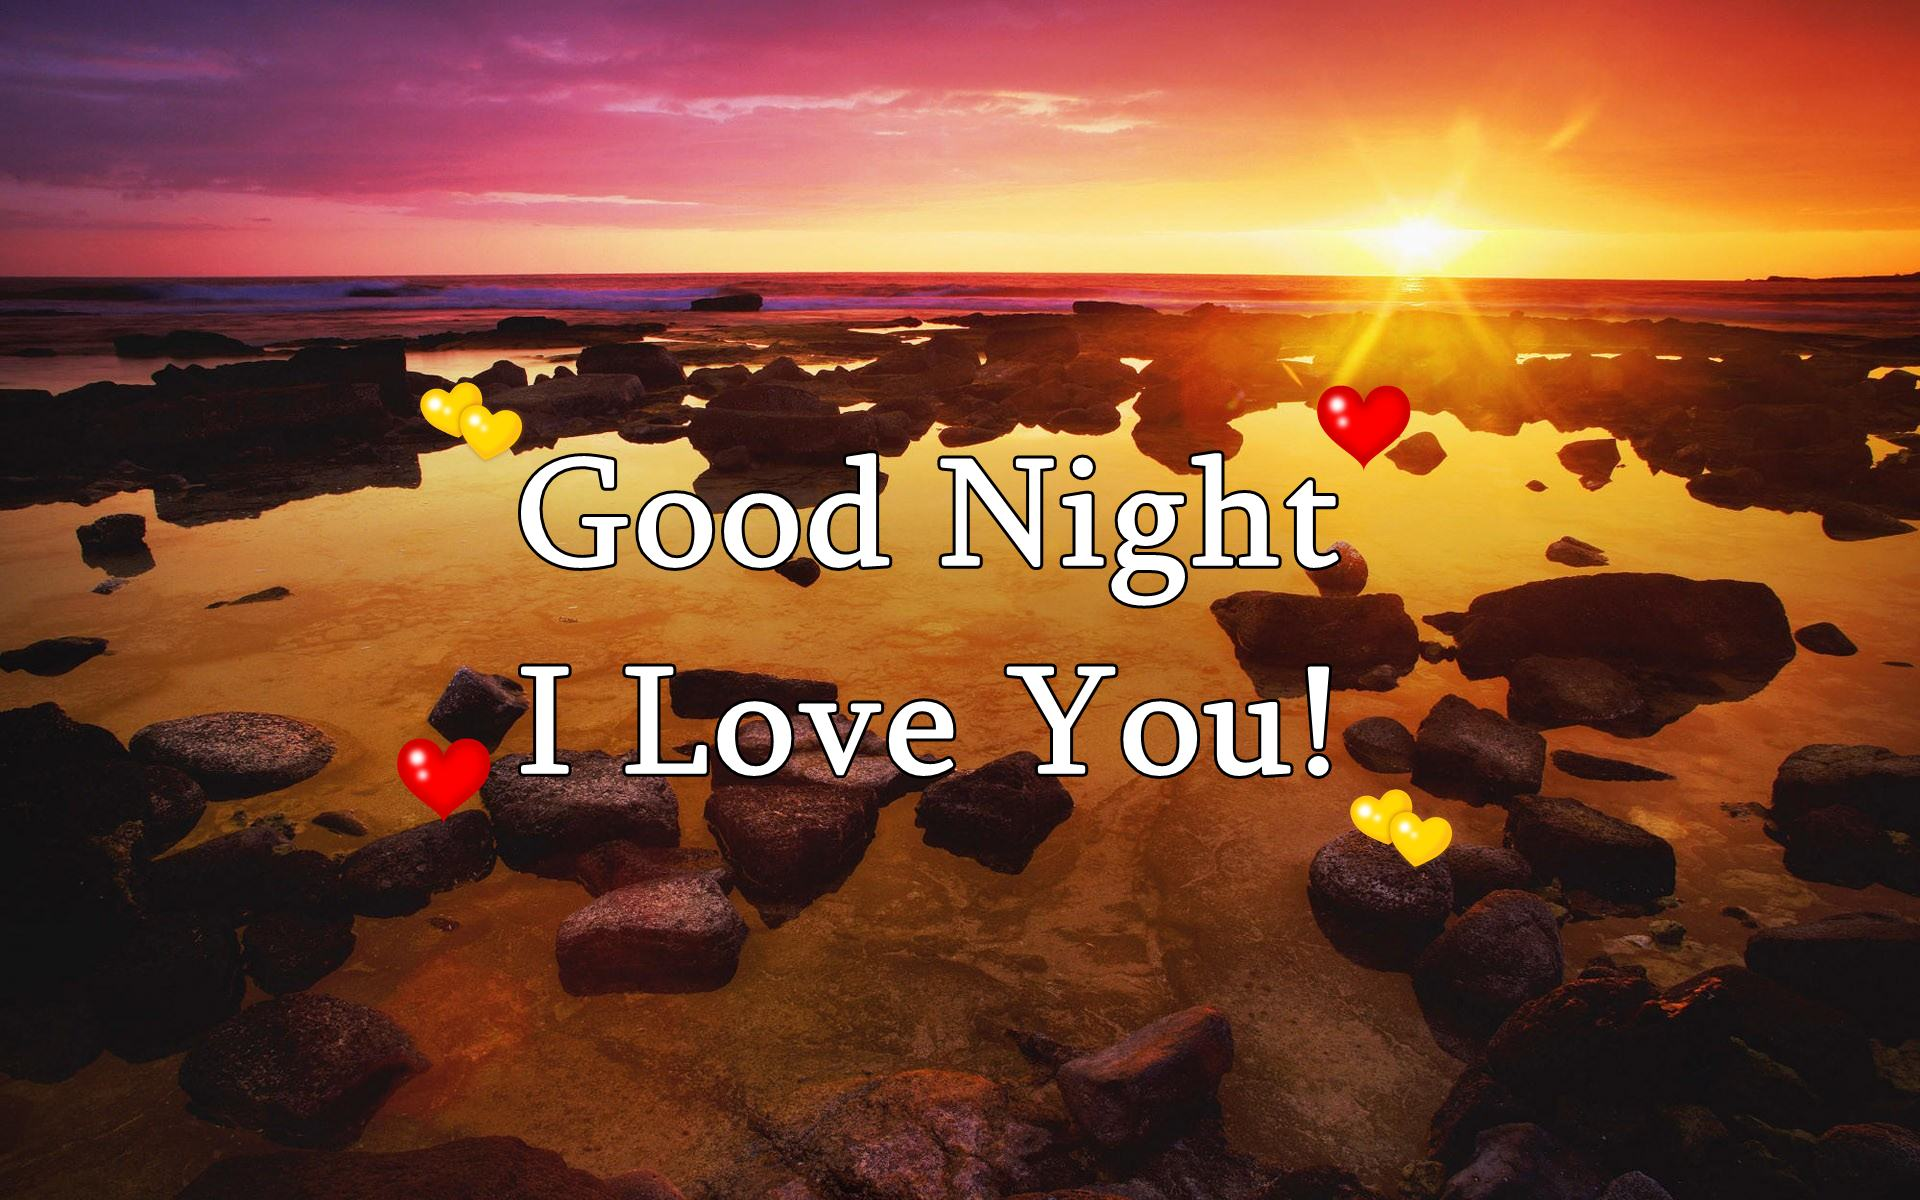 Good Night Quotes Love You. QuotesGram